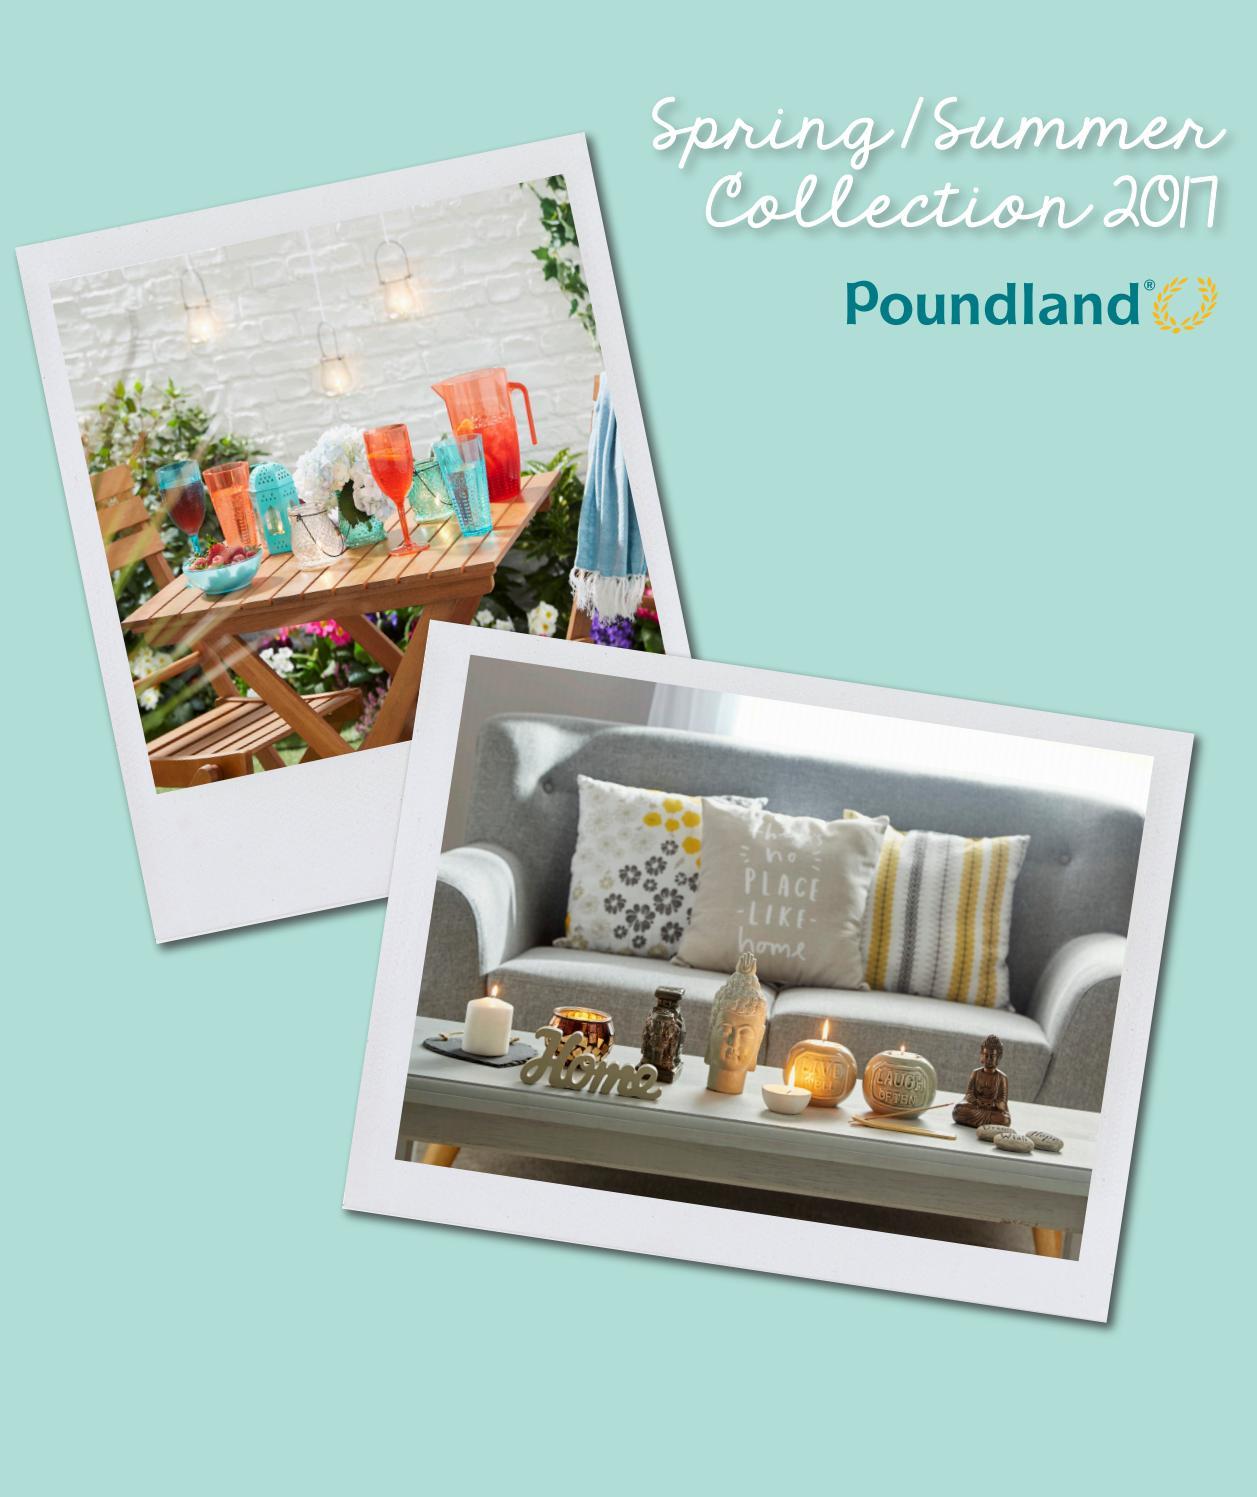 White apron poundland - Poundland Ss 2017 Collection Thumbnail